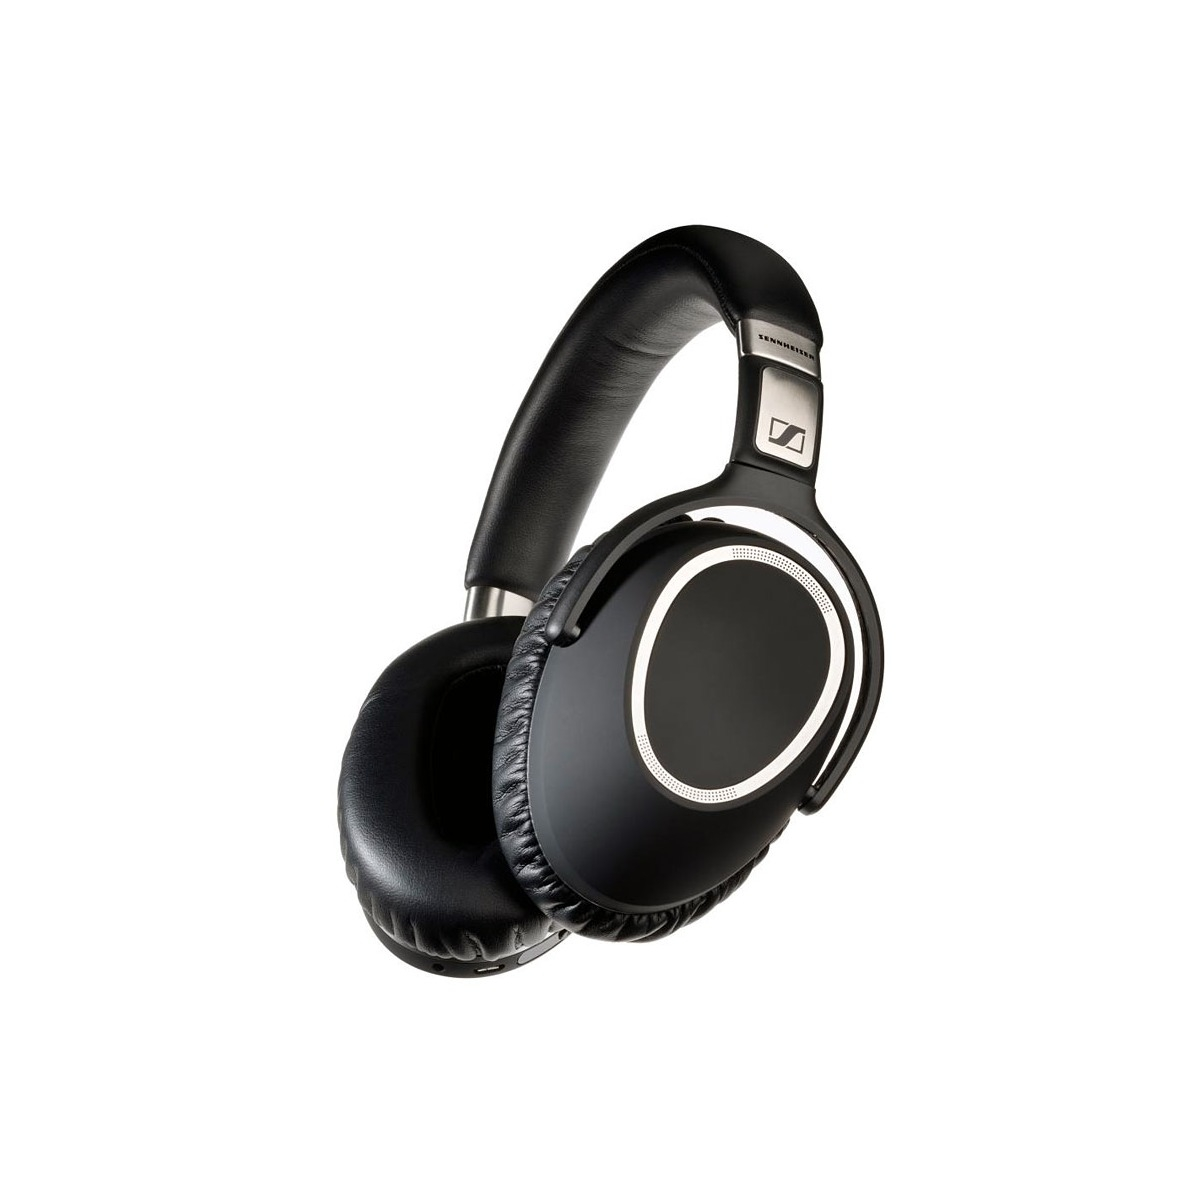 Sennheiser PXC 550 WIRELESS Bluetooth Headphone